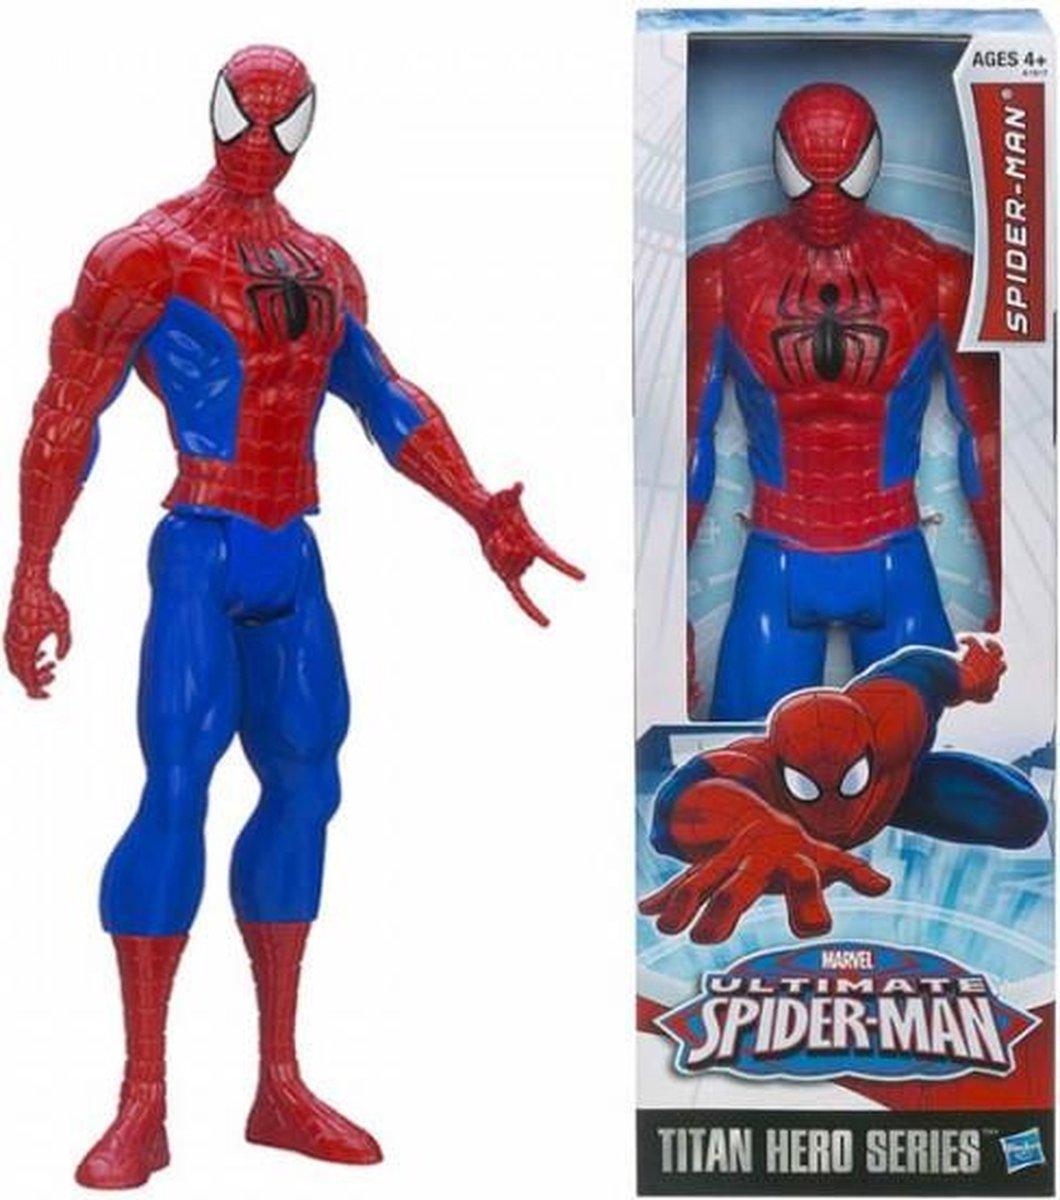 Hasbro Spider-Man Titan Hero Series